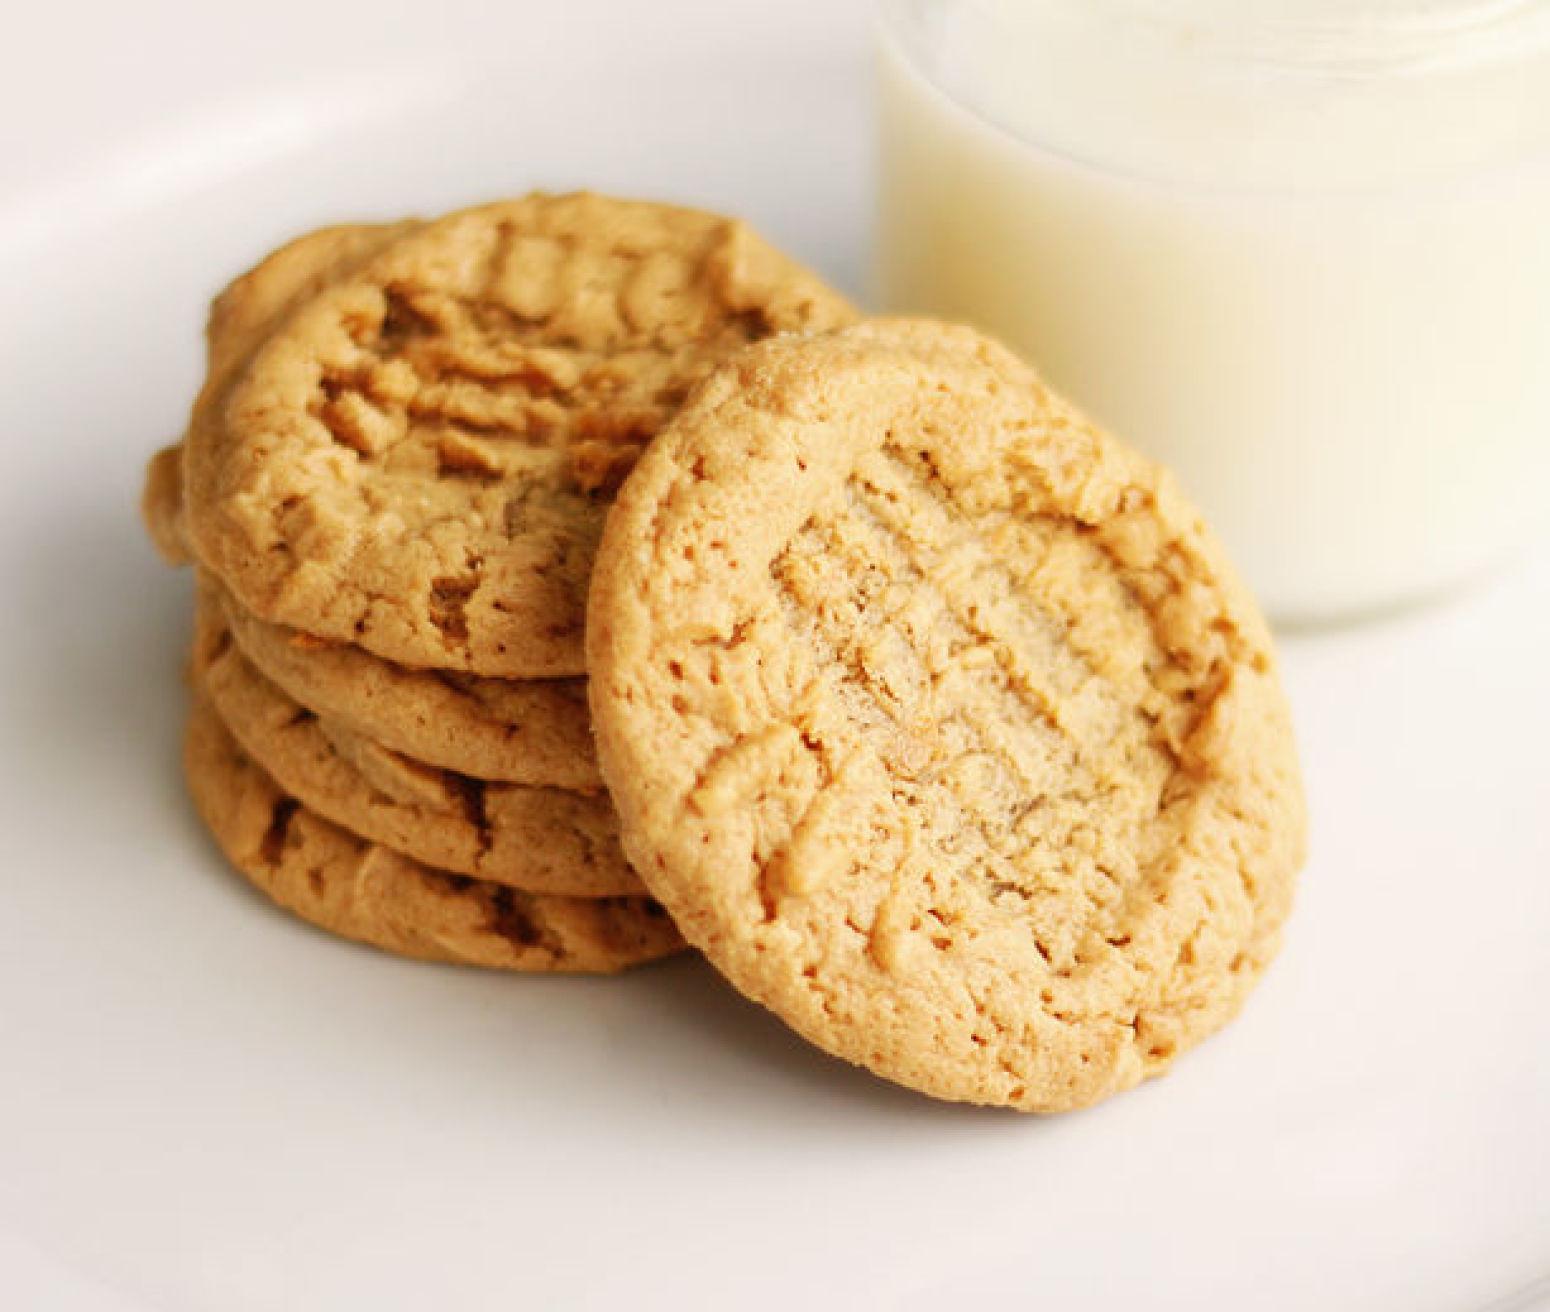 Peanut Butter Cookies No Flour  Peanut Butter cookies no sugar no flour added Recipe